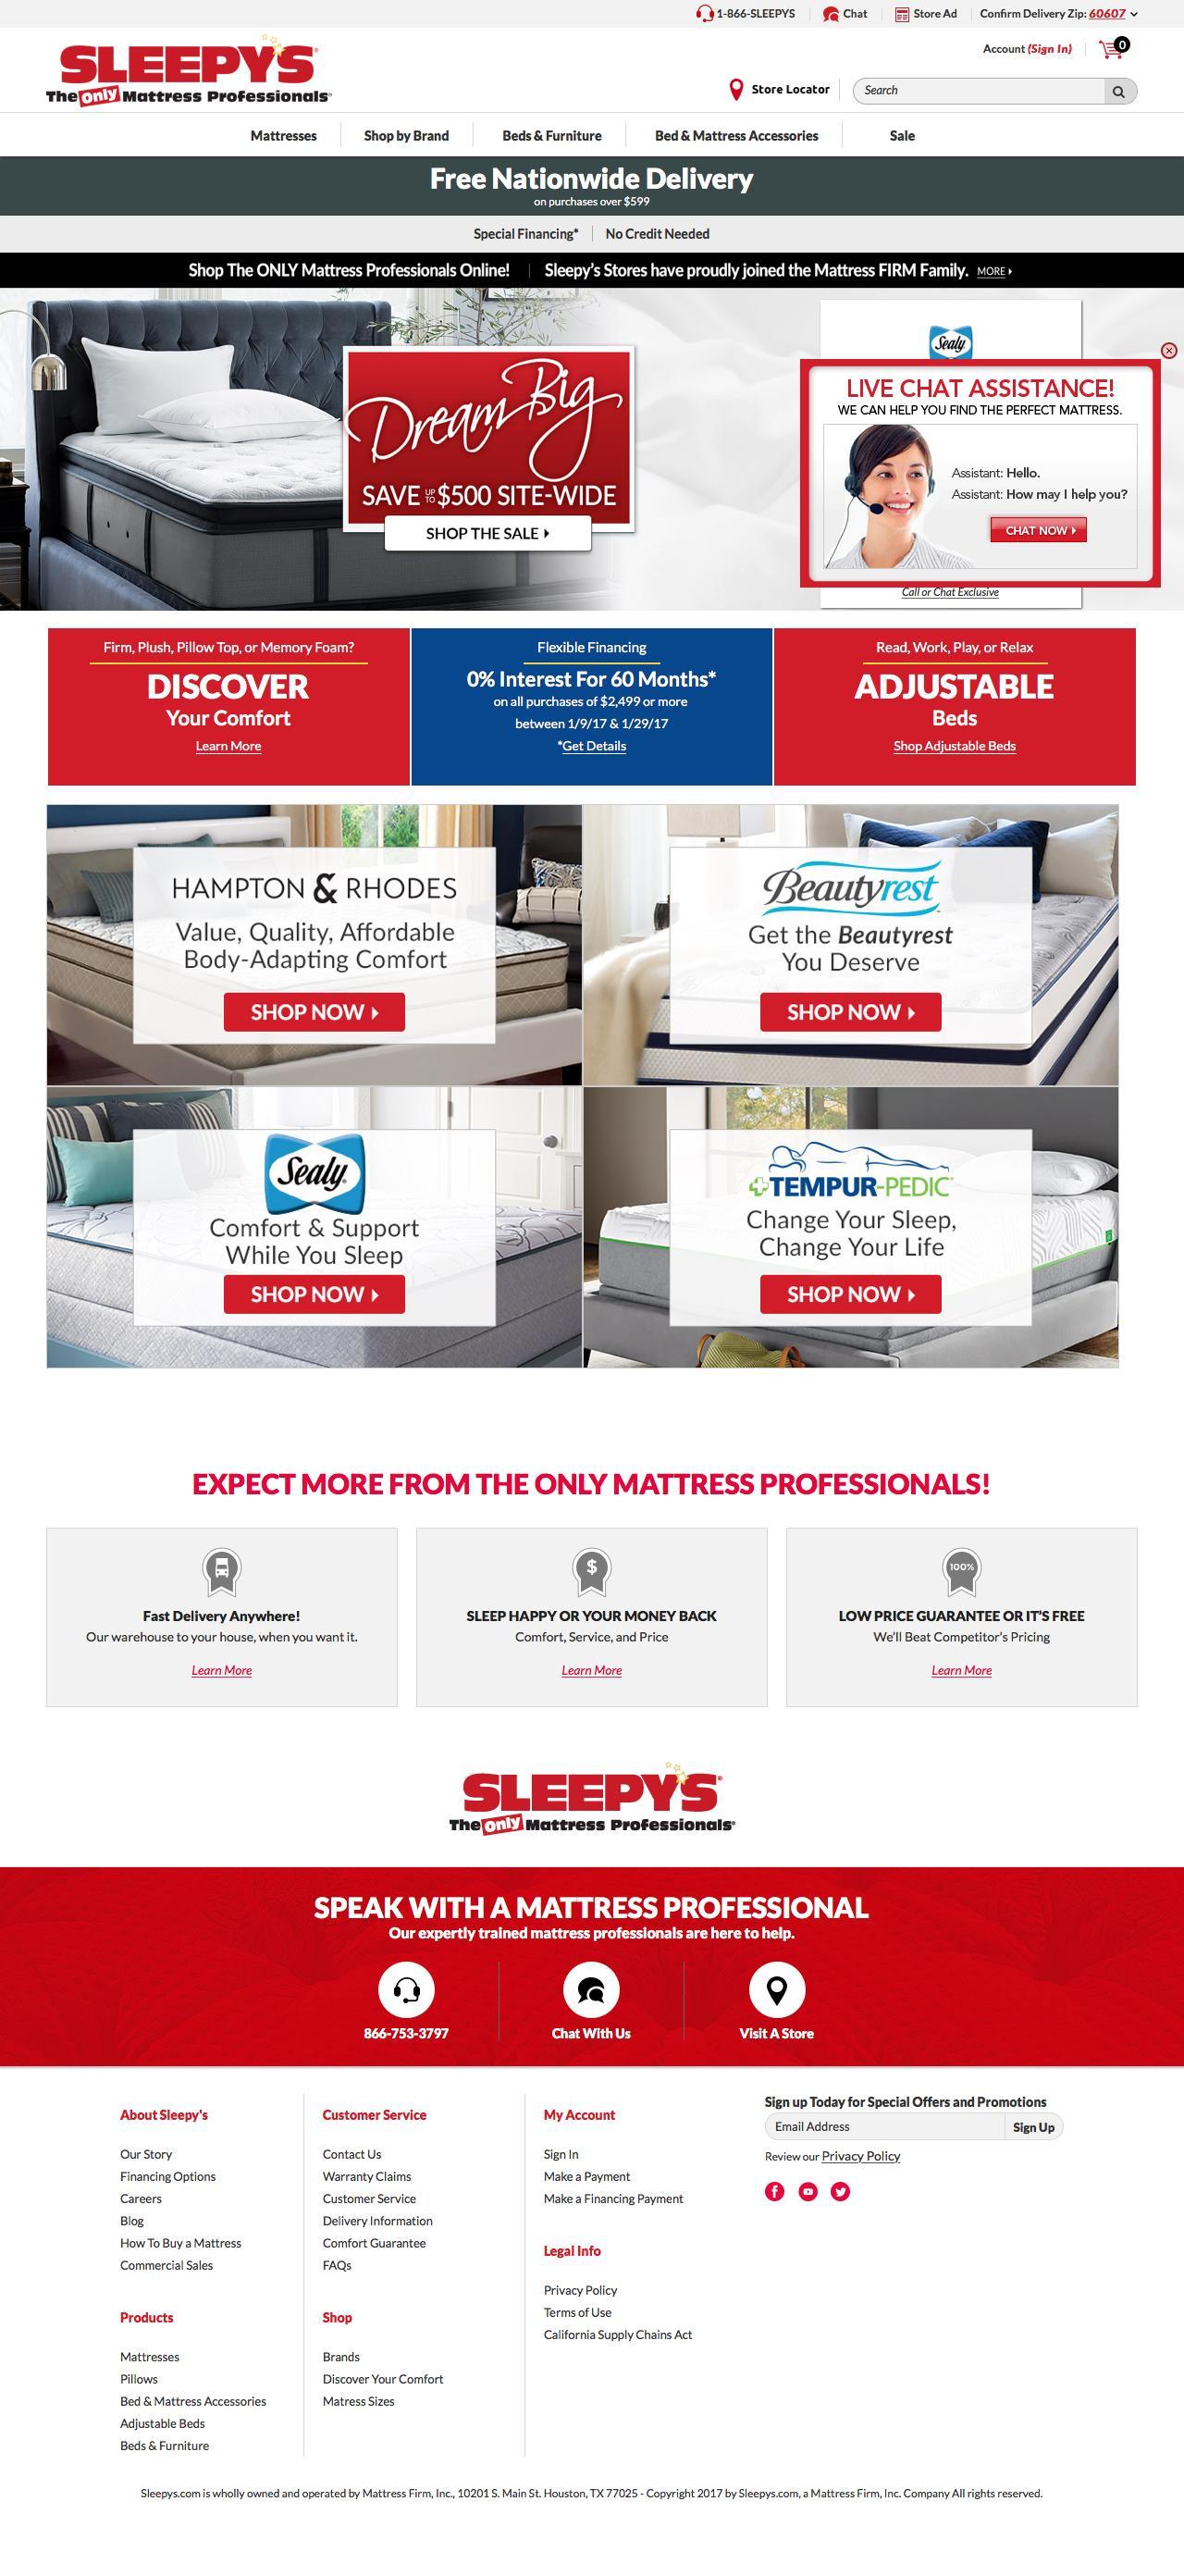 sleepy s the mattress professionals